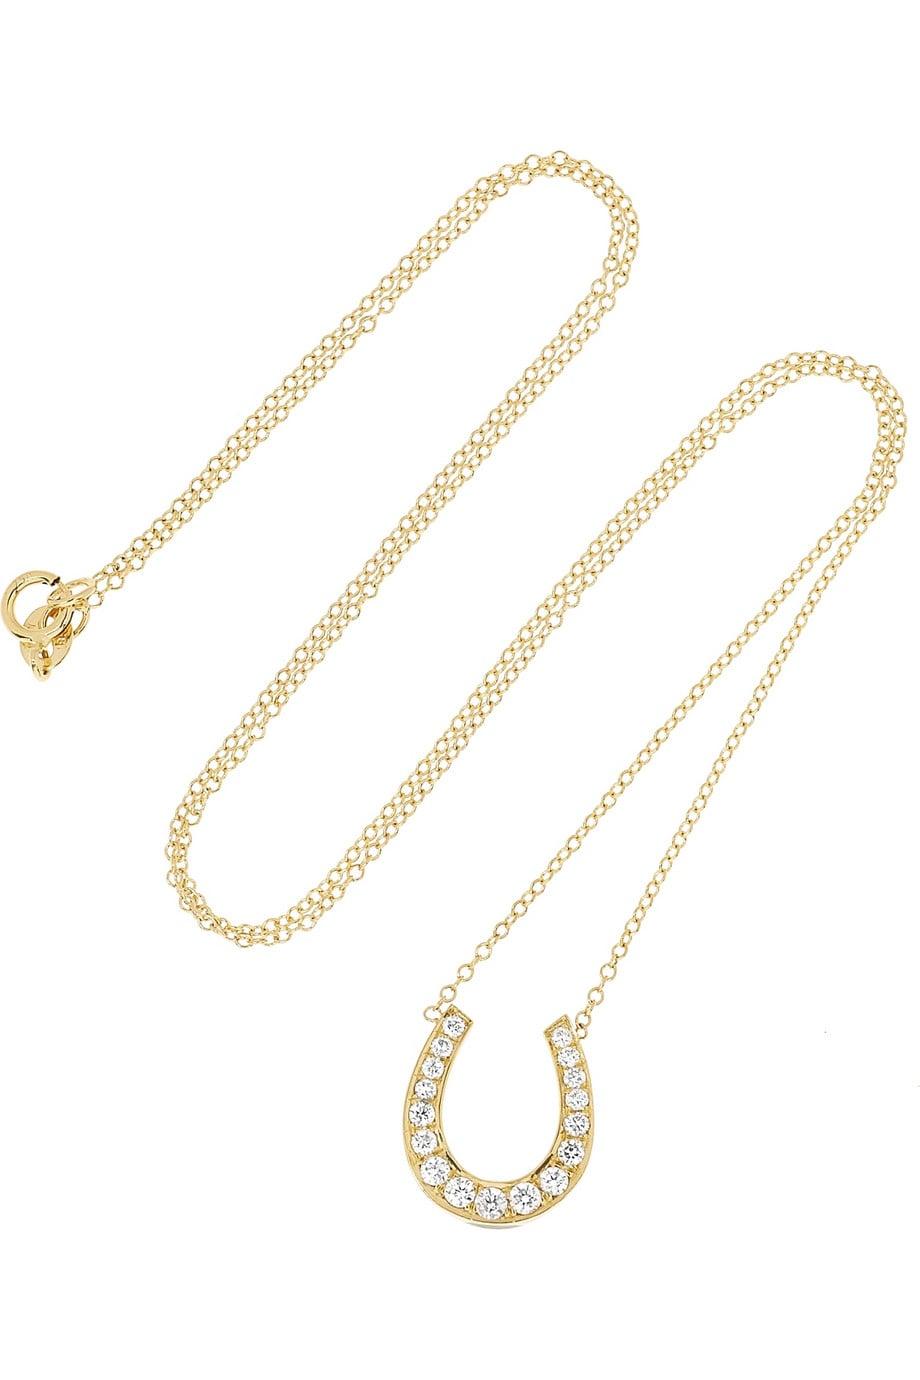 Anita Ko's gold diamond horseshoe necklace ($3,675) is simply irresistible. I'd wear it on my neck 365 days of the year. — Chi Diem Chau, associate editor